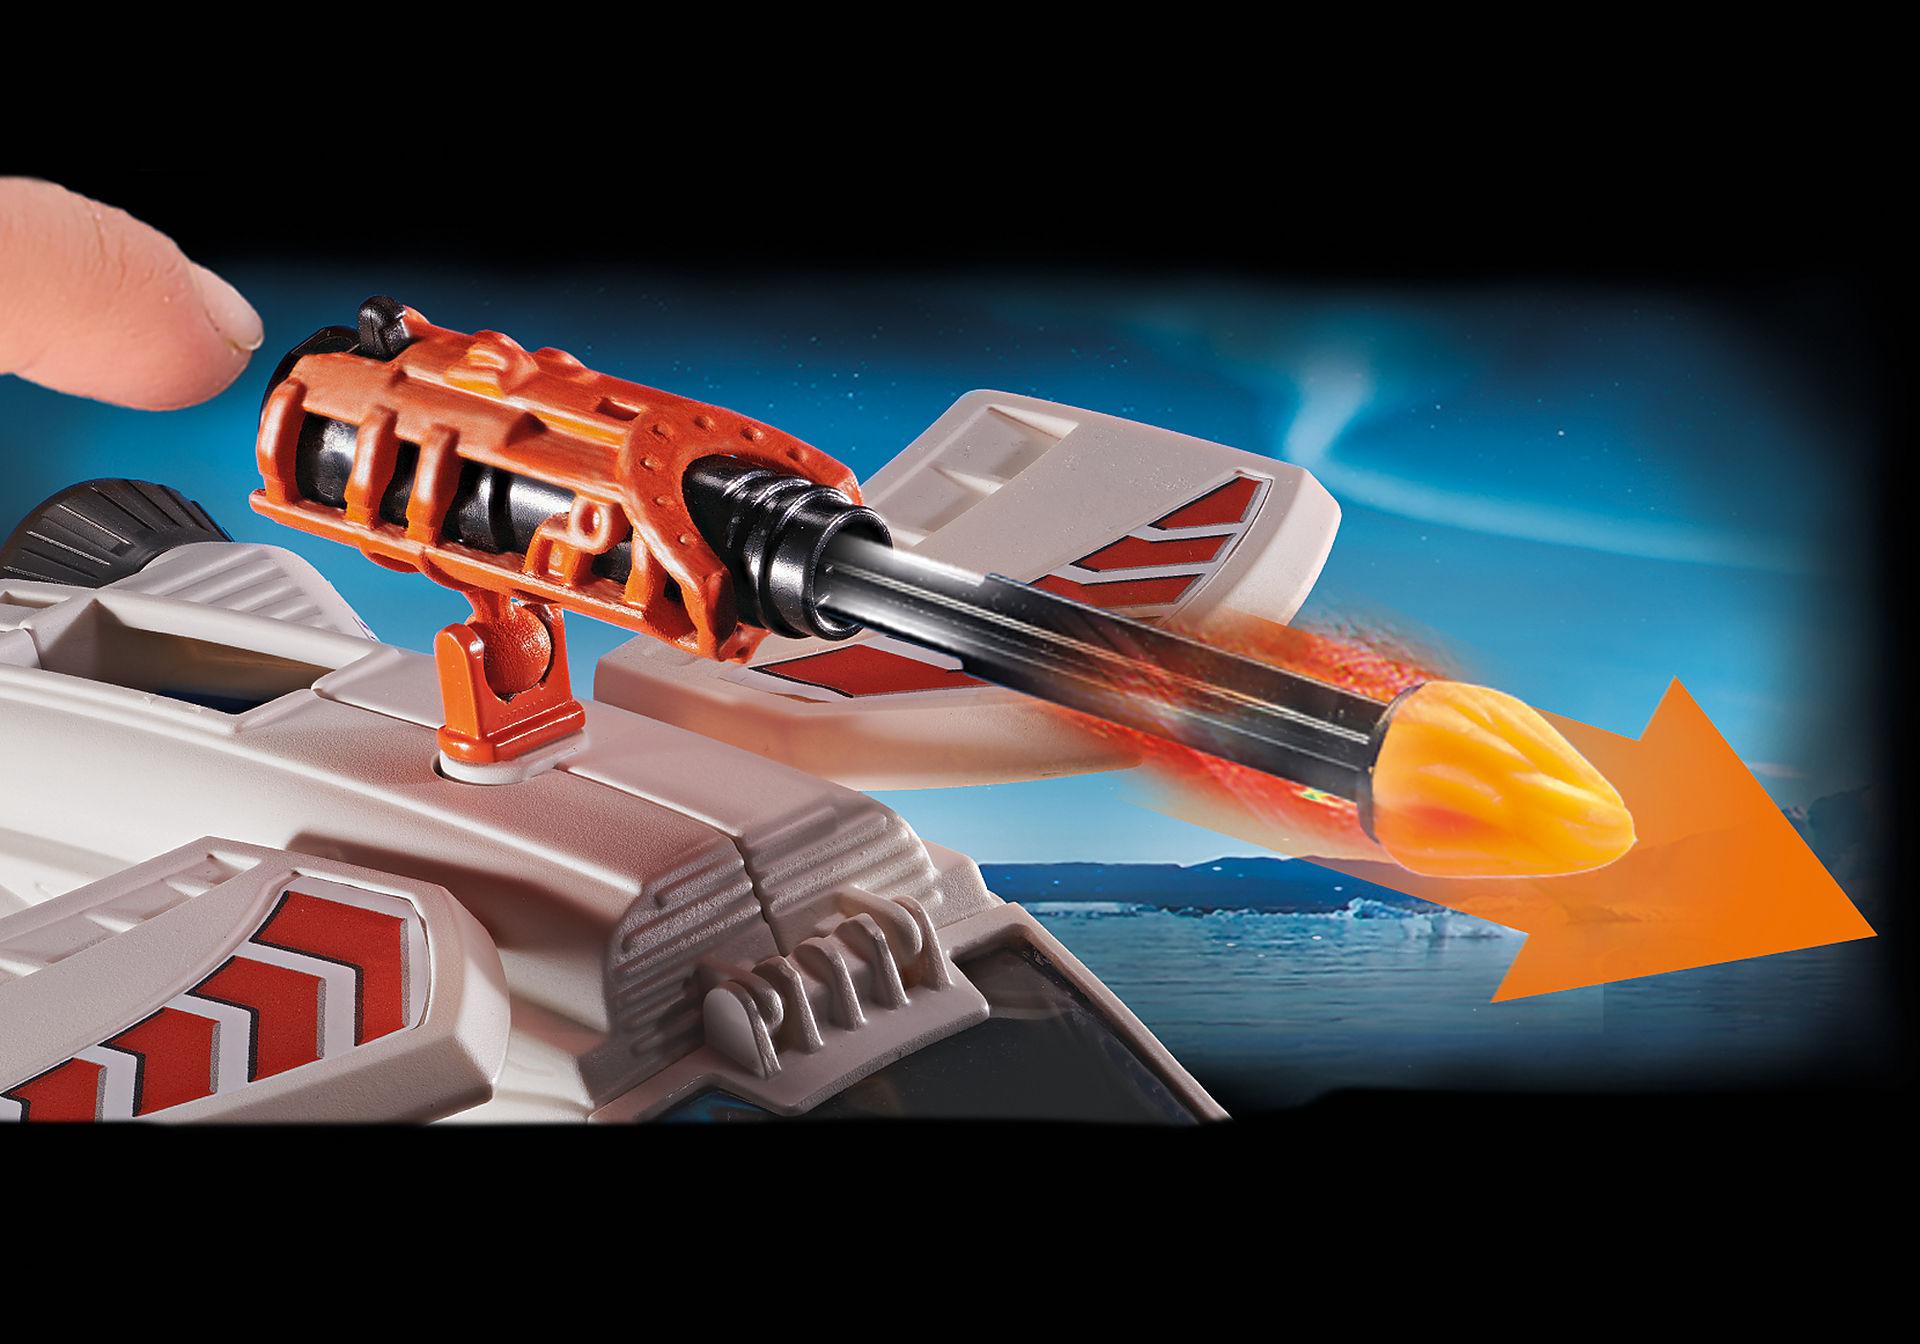 70231 Spy Team Planador de Neve zoom image6